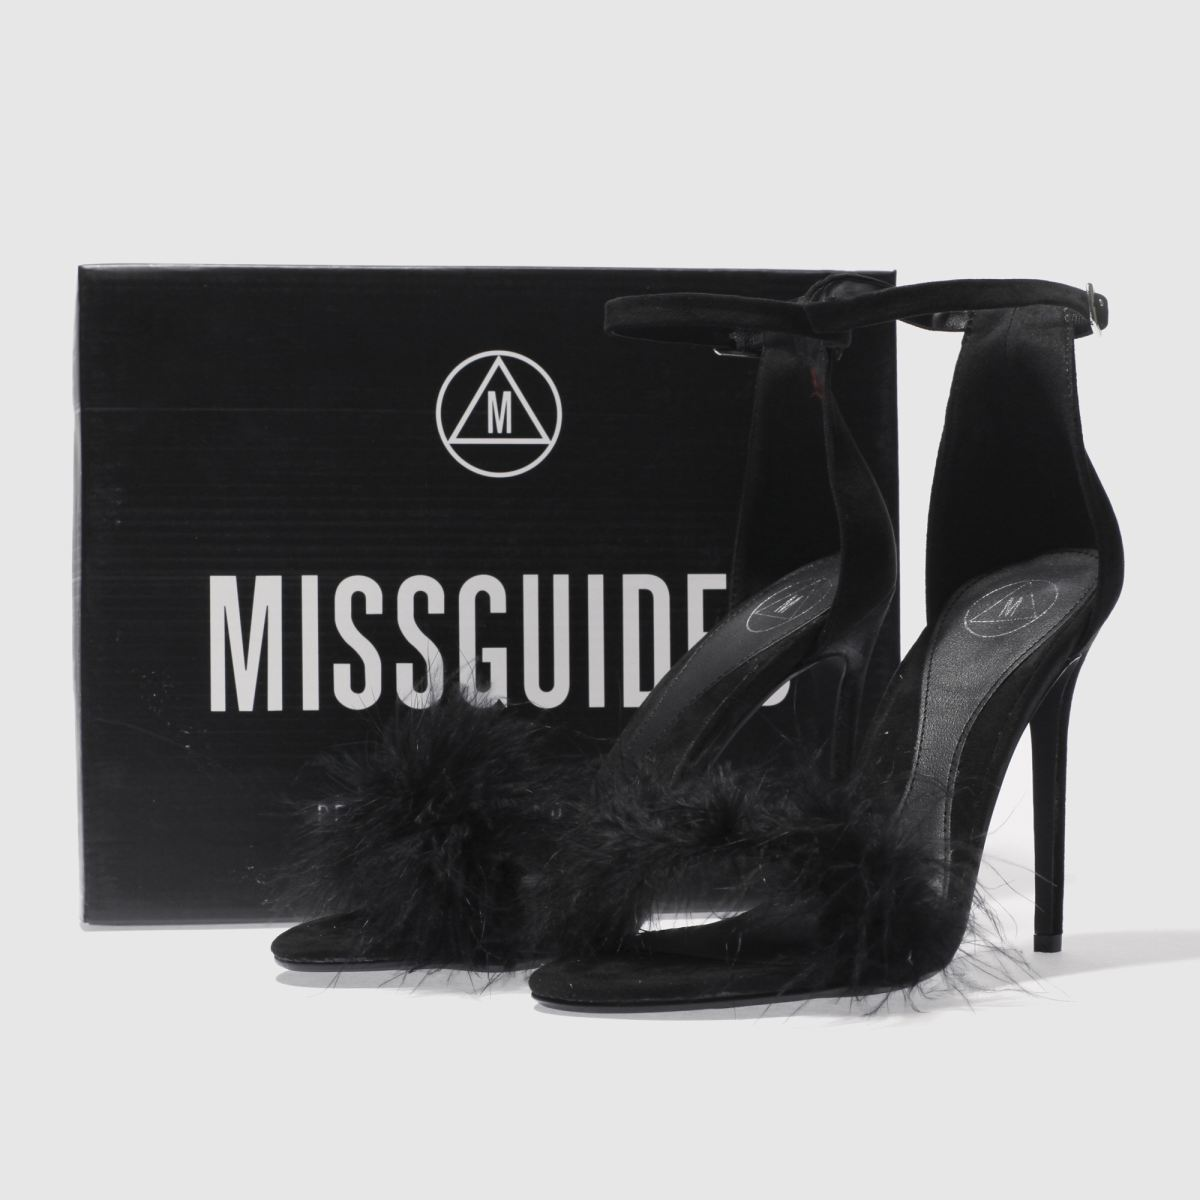 Damen Schwarz missguided Feather Barely There High Heels | Schuhe schuh Gute Qualität beliebte Schuhe | 248486